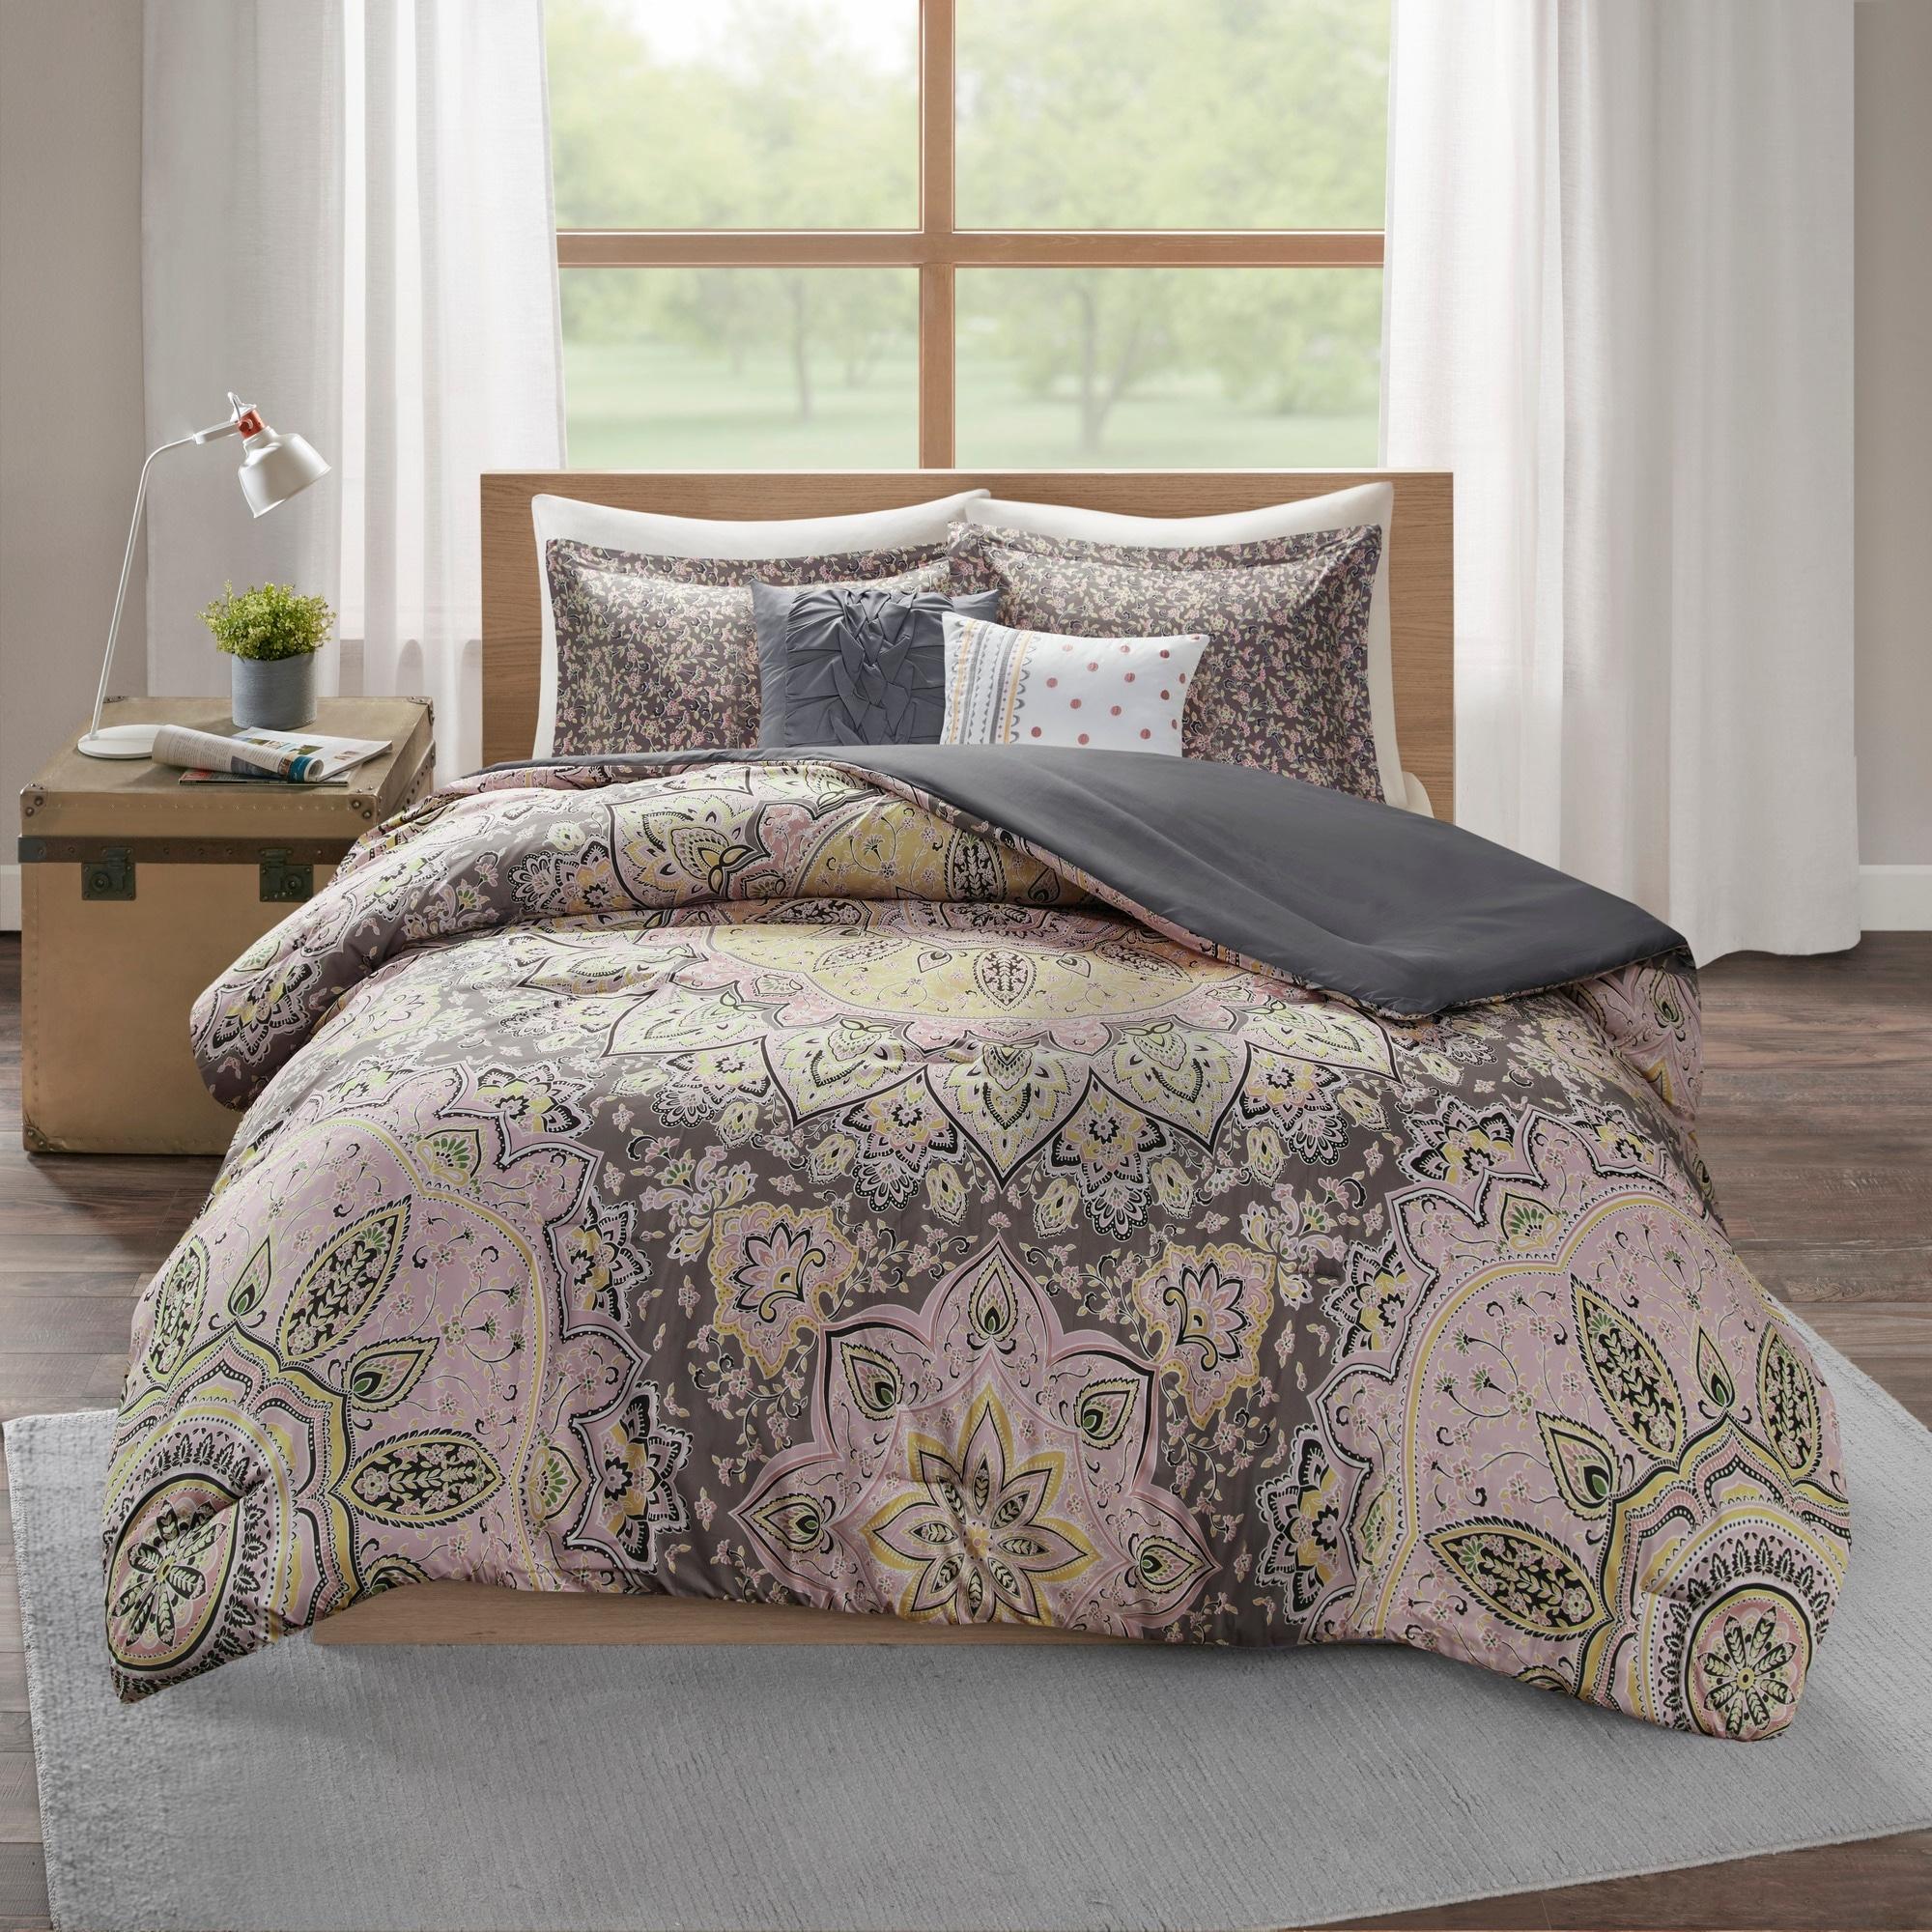 Skye Boho 5 Piece Comforter Set By Intelligent Design On Sale Overstock 20901619